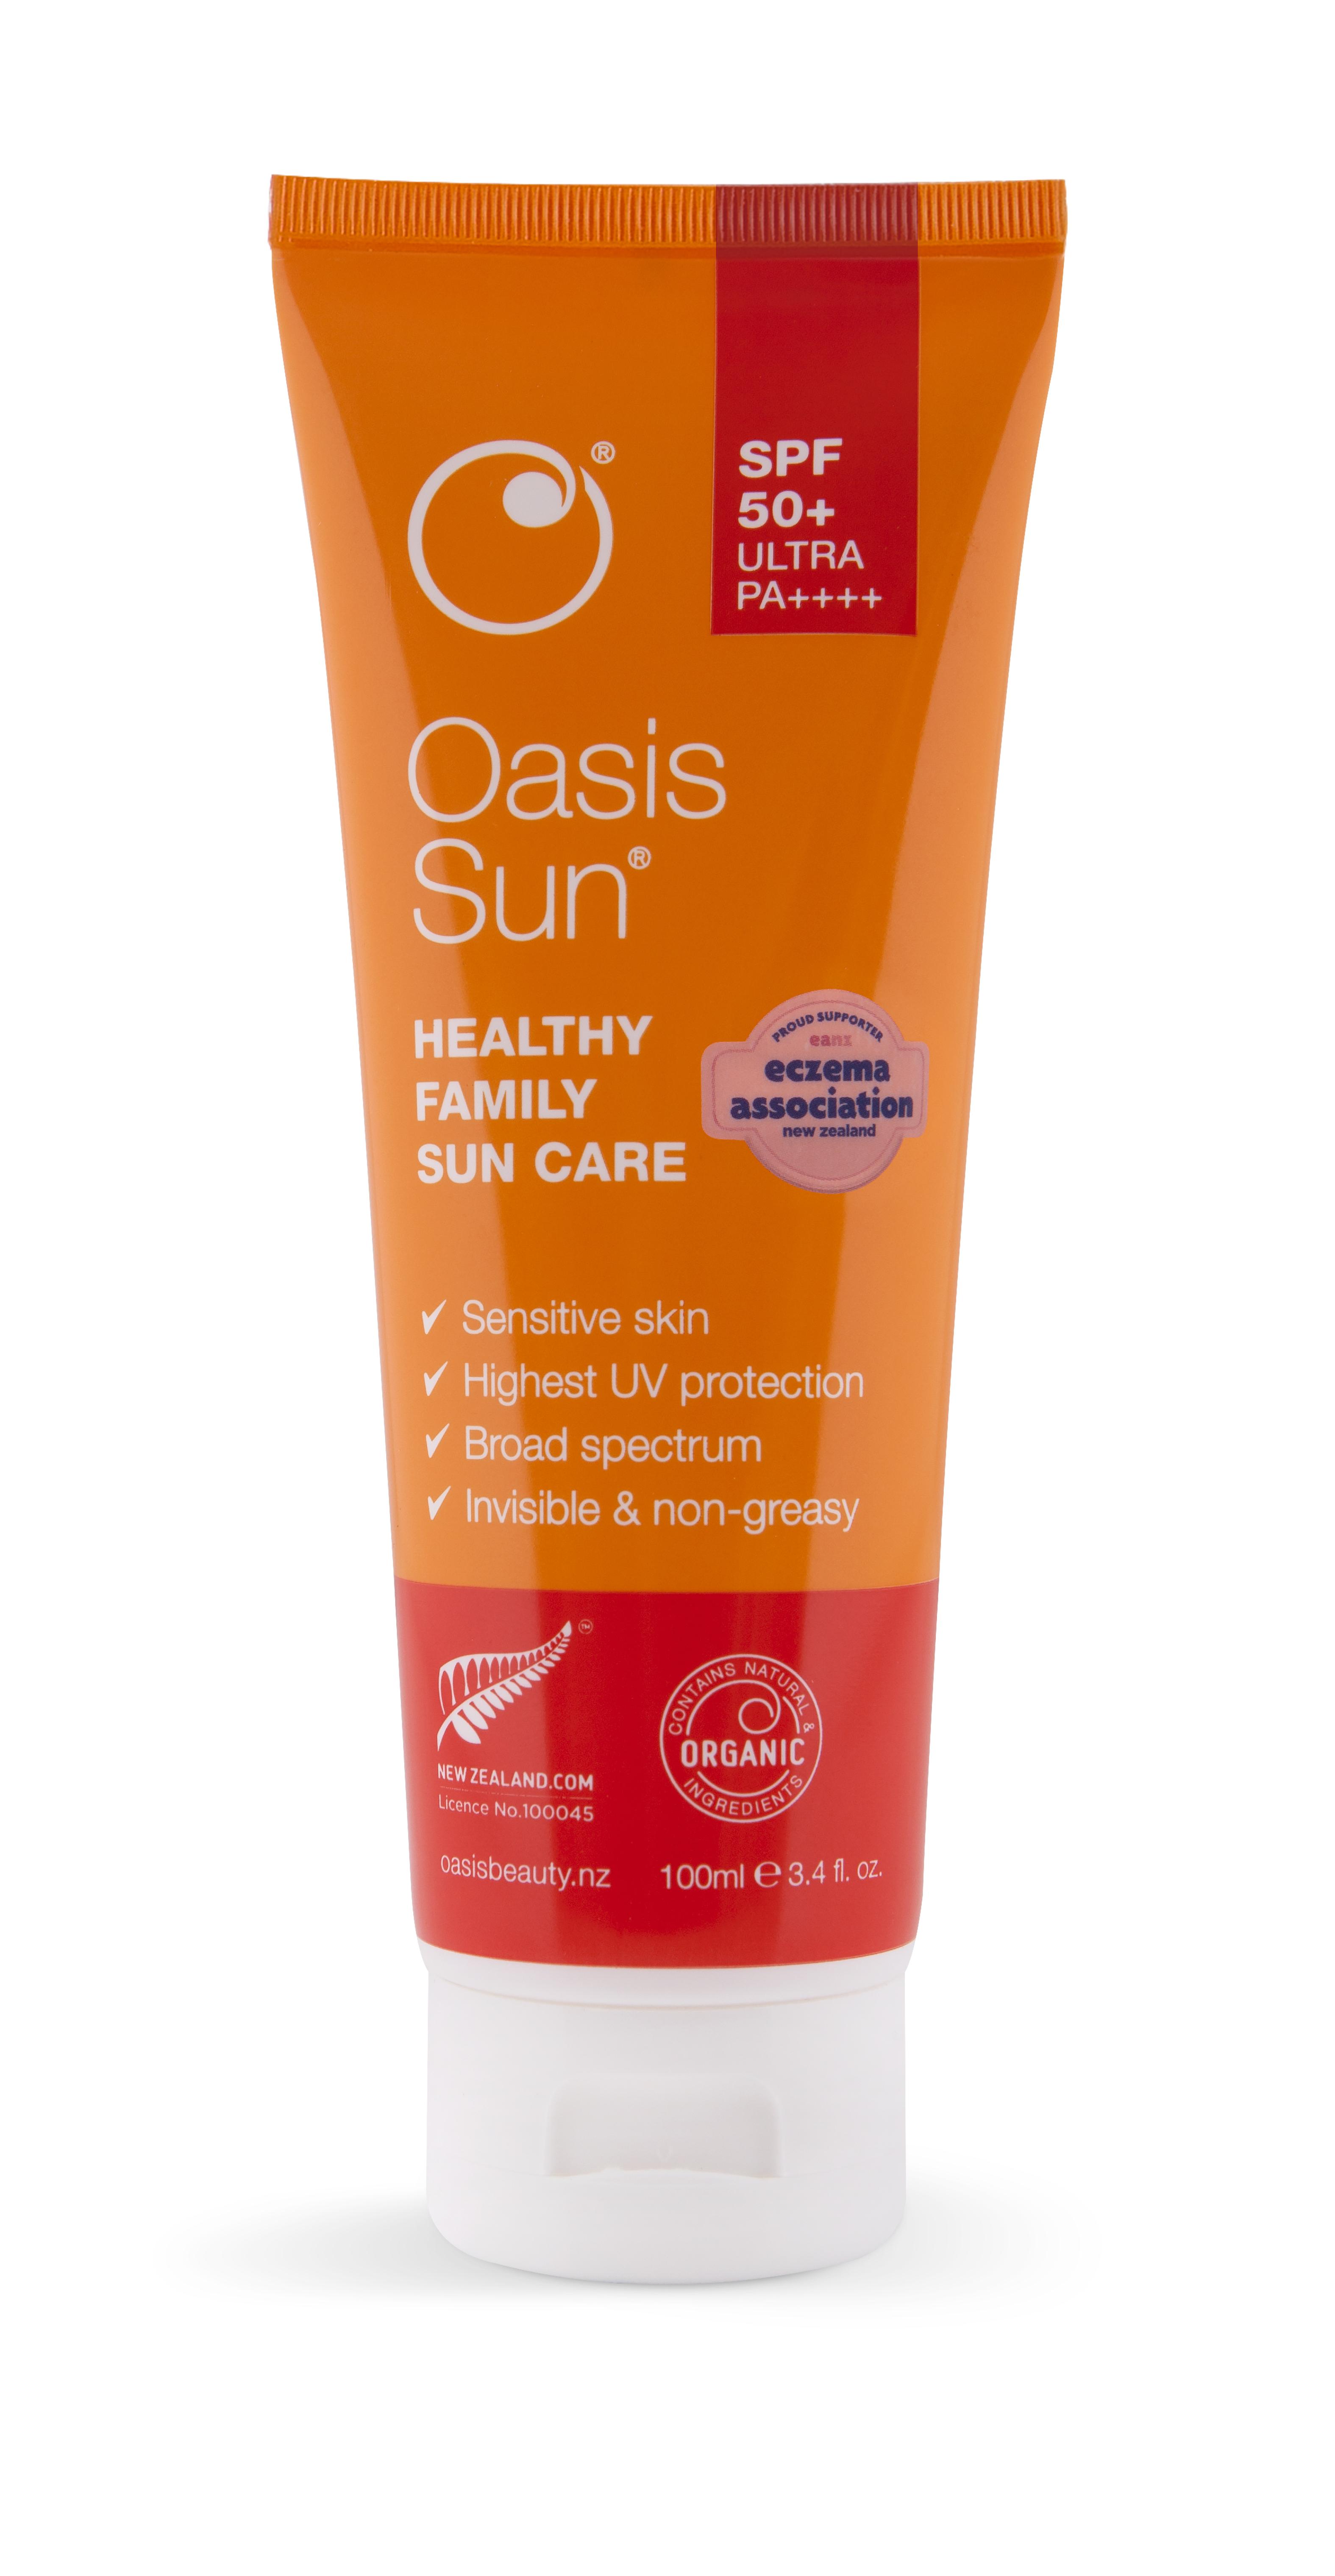 Oasis Sun SPF 50 + Ultra Protection Sunscreen